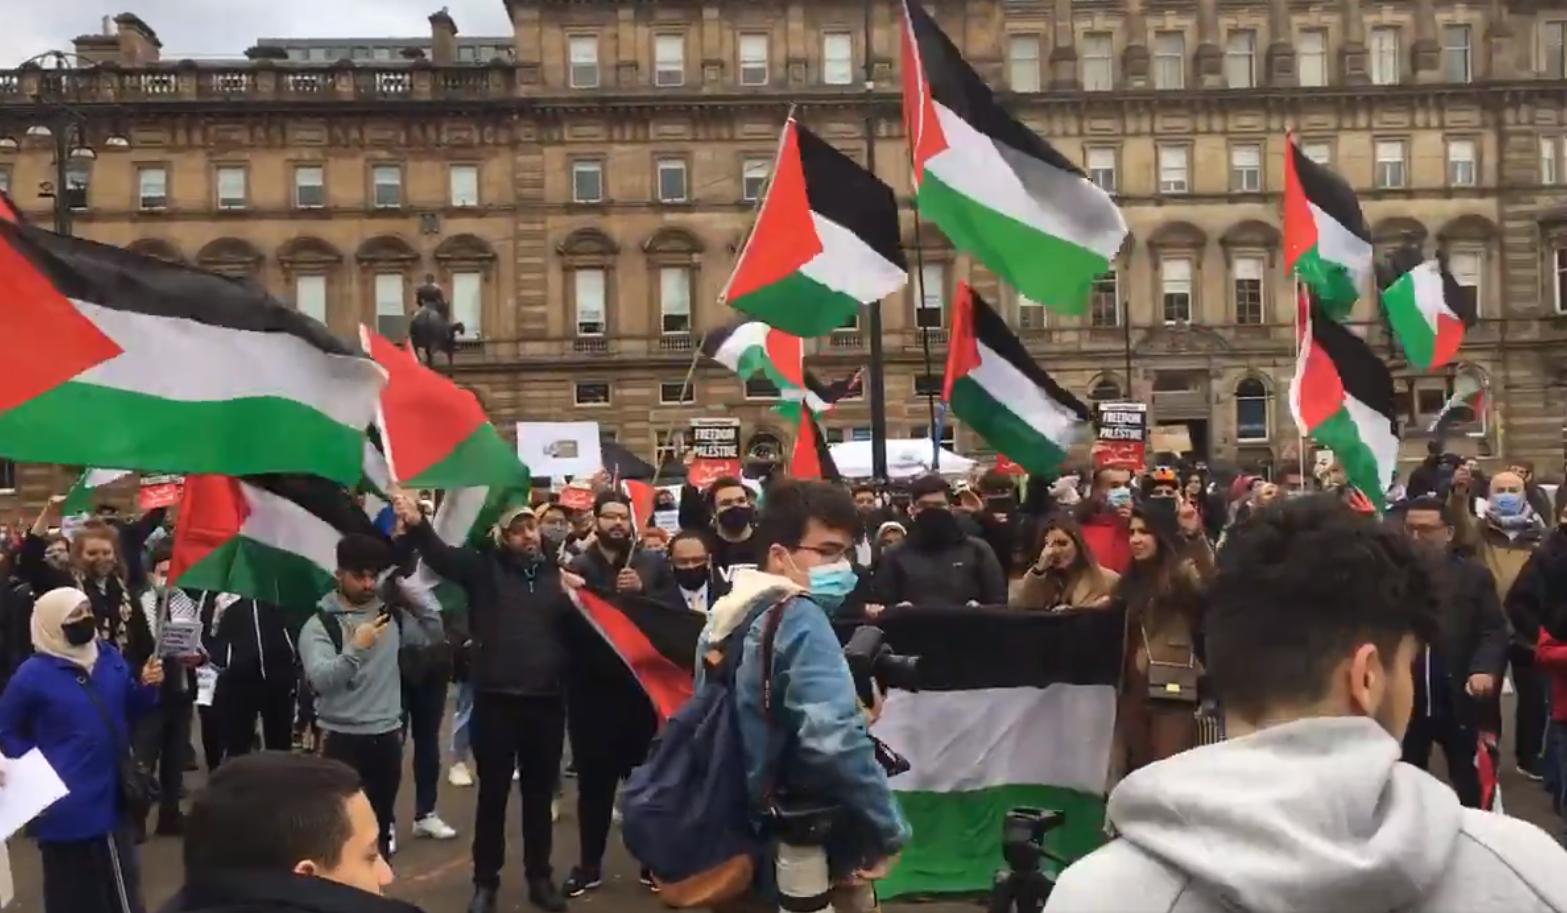 Glasgow shows solidarity to Palestine in save Sheikh Jarrah movement